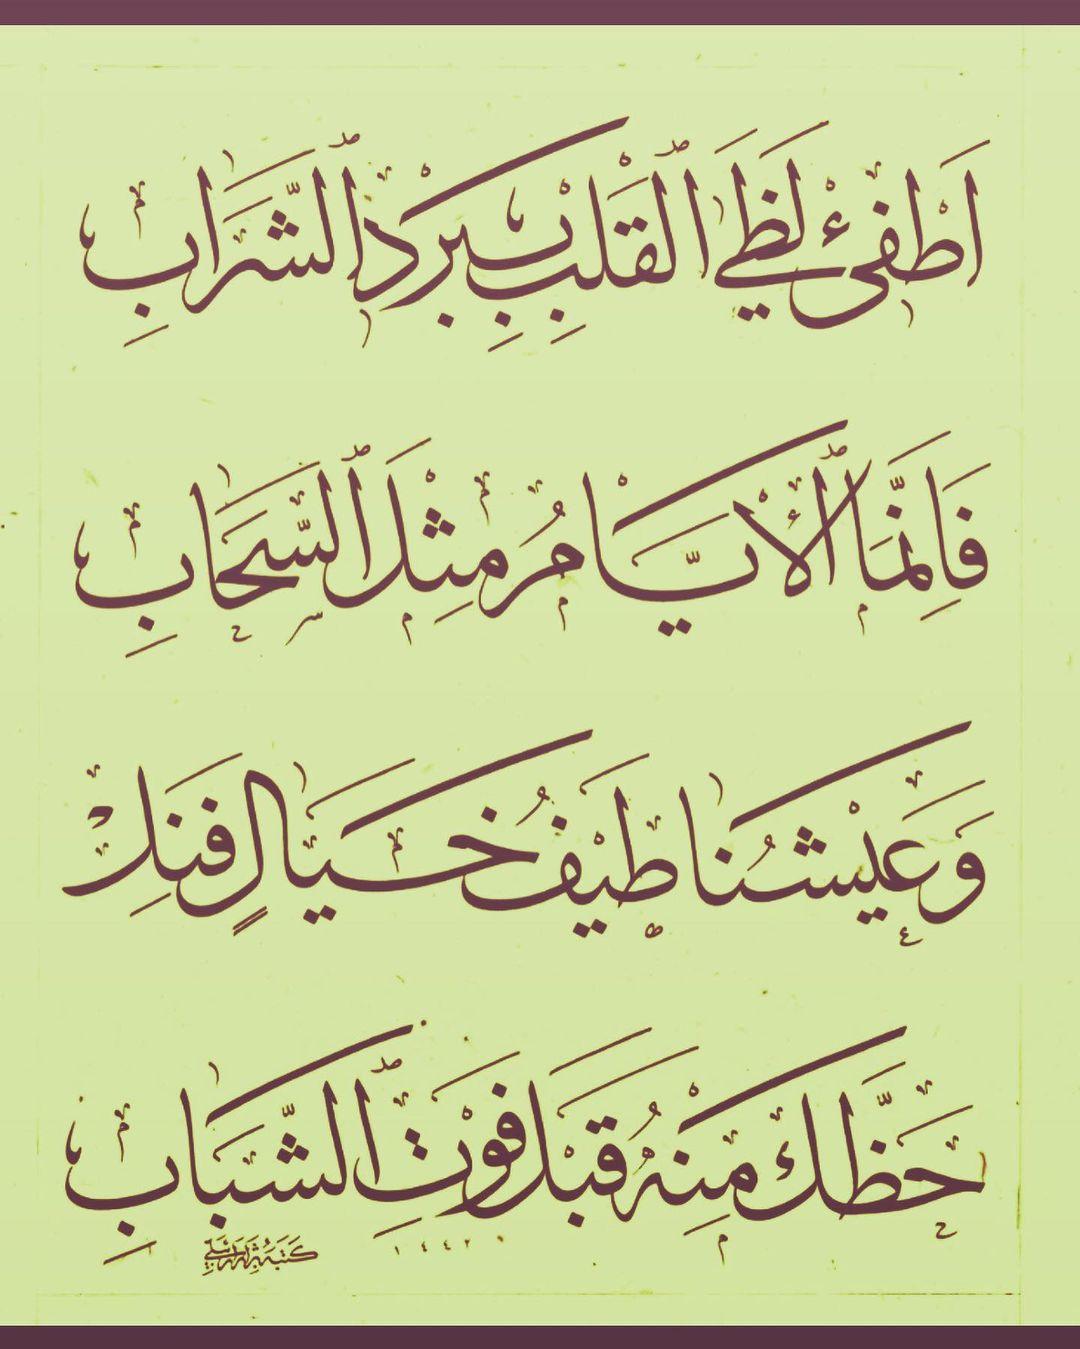 Professional Calligrapher Bijar Arbilly Calligraphy  اطفئ لظي القلب ببرد الشراب .. عمر الخيام #calligraphy #kunst #art #tehran #istan… 268